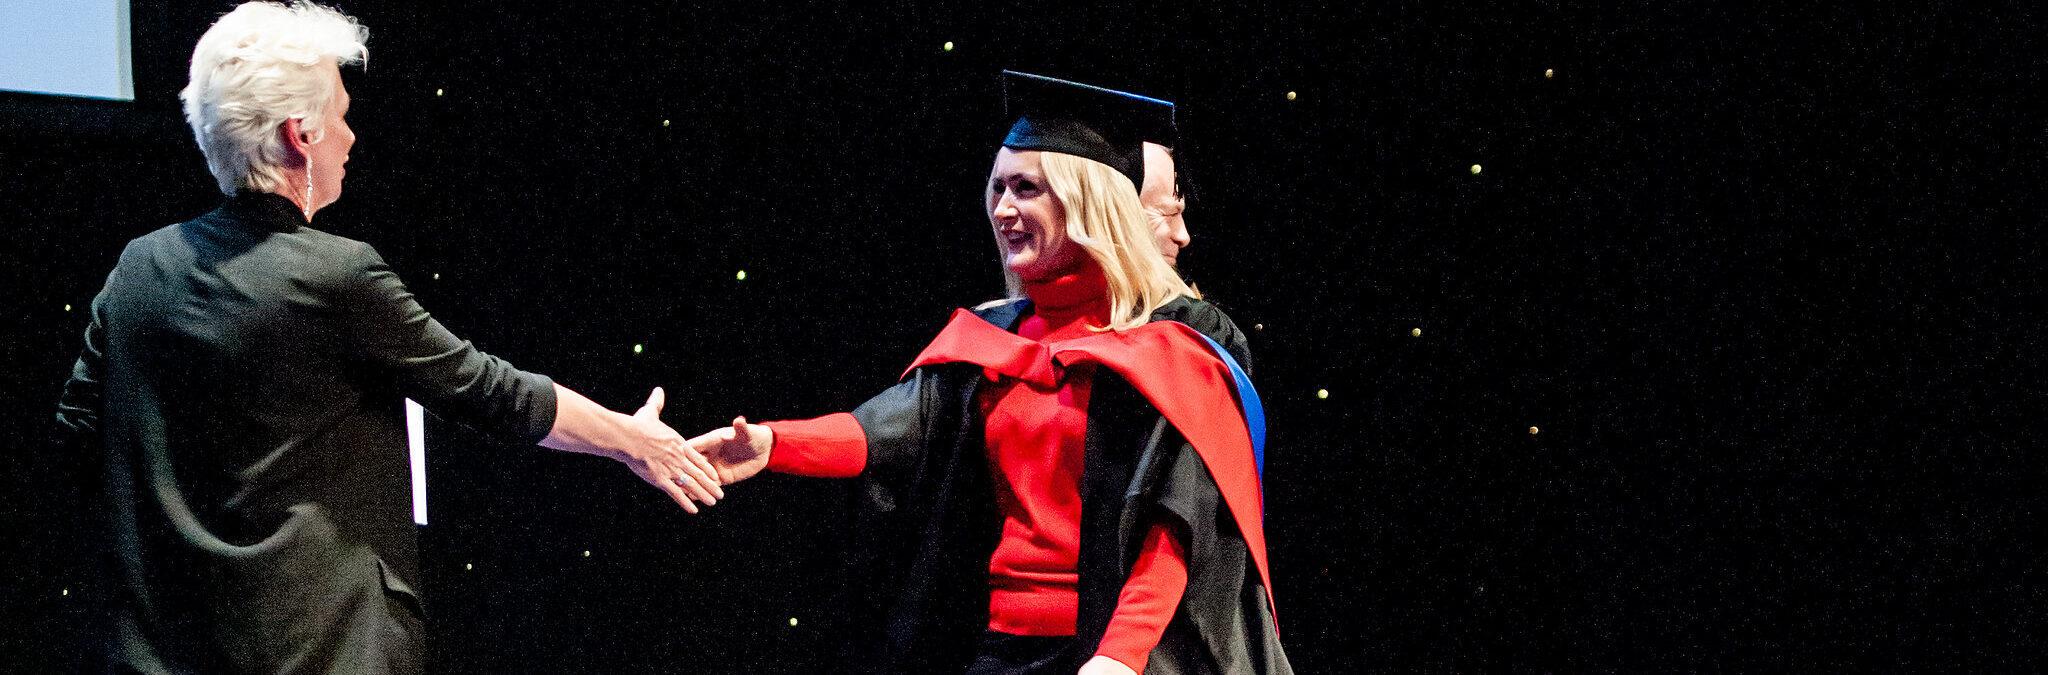 Student graduating Bedford College Achievements Ceremony